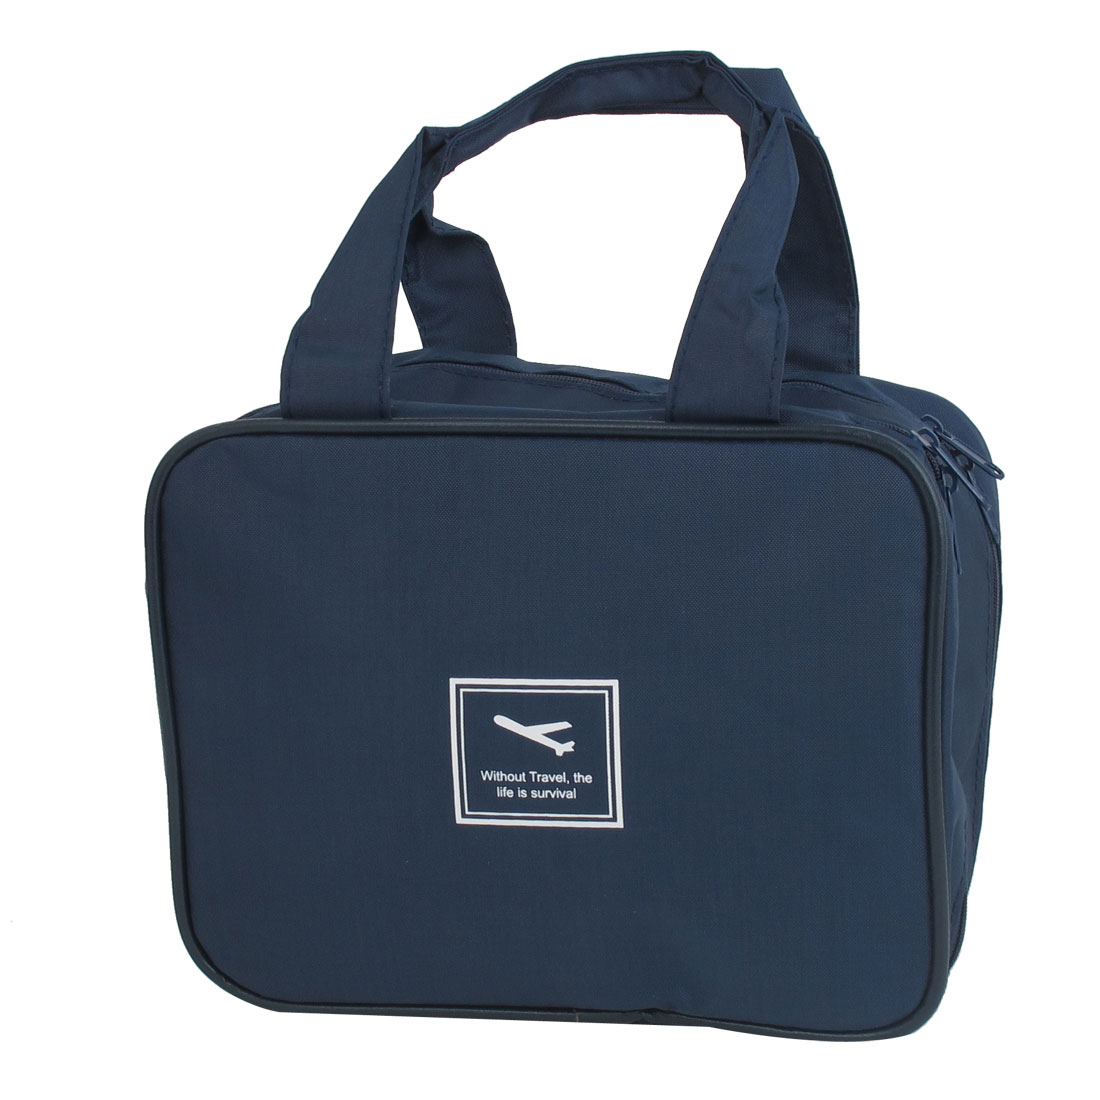 Outdoor Travel Toiletry Toiletries Cosmetic Beauty Wash Bag Handbag Dark Blue